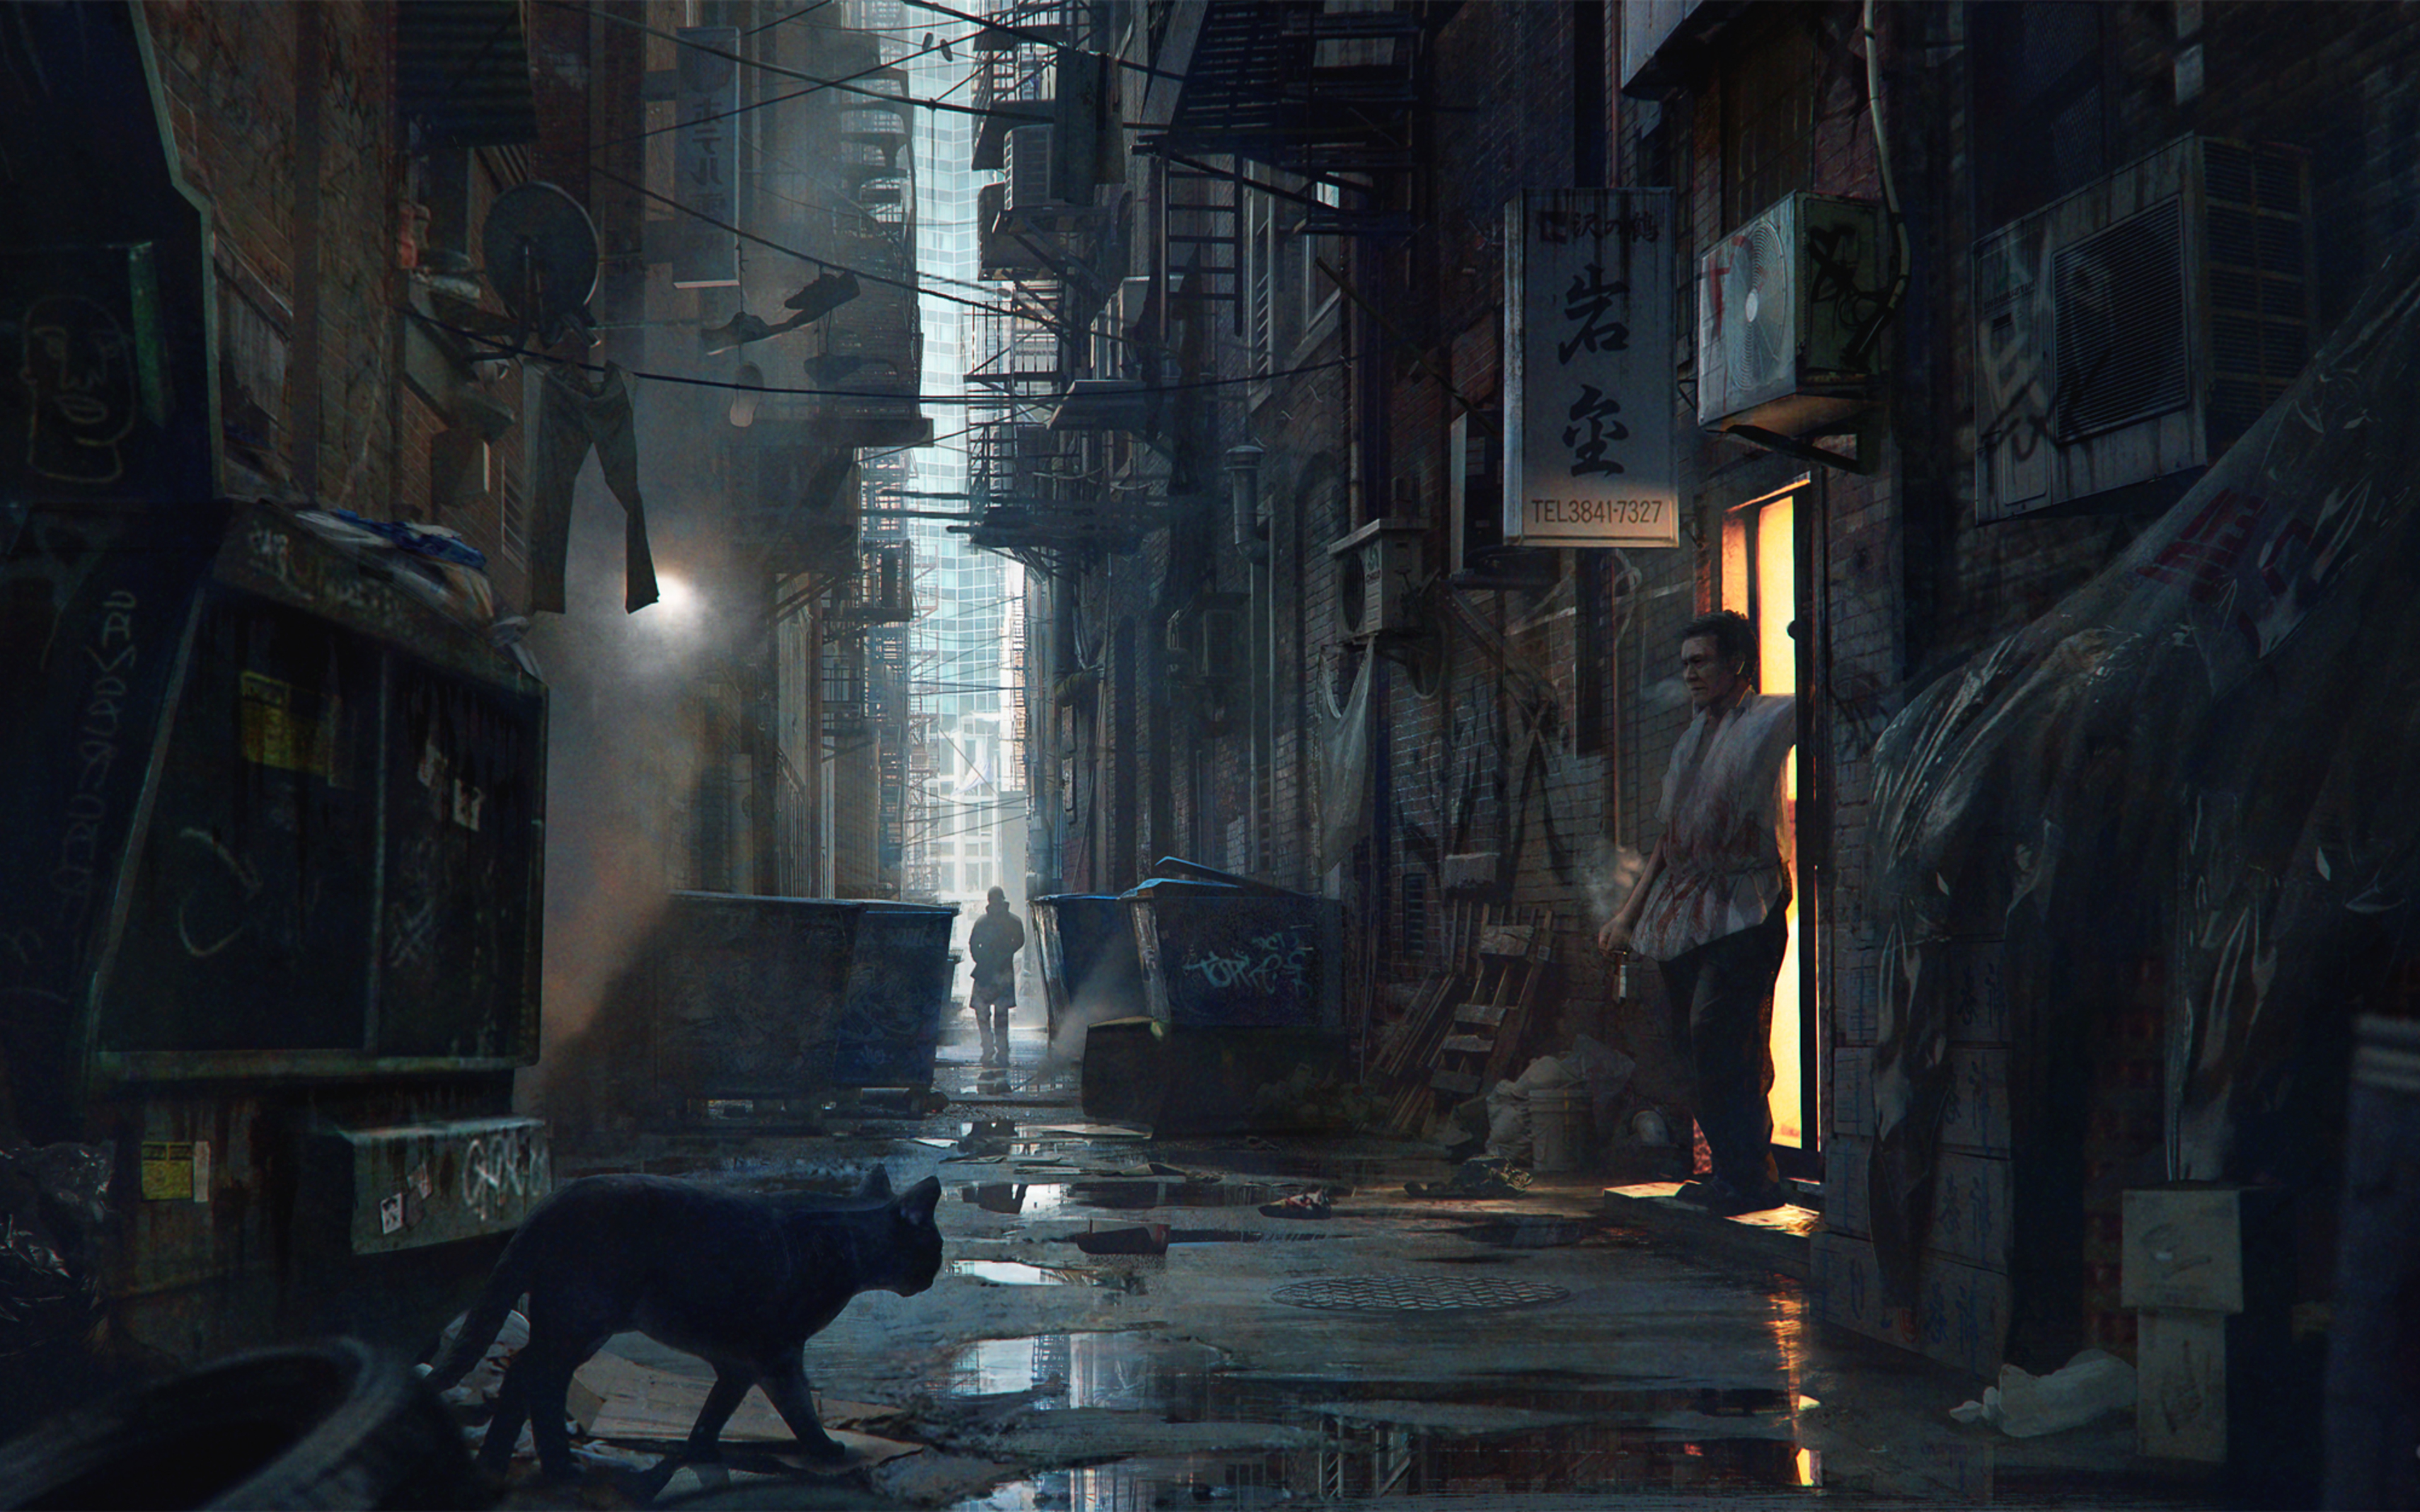 Detroit Become Human Desktop Wallpaper: 3840x2400 Alleyway Detroit Become Human 4k HD 4k